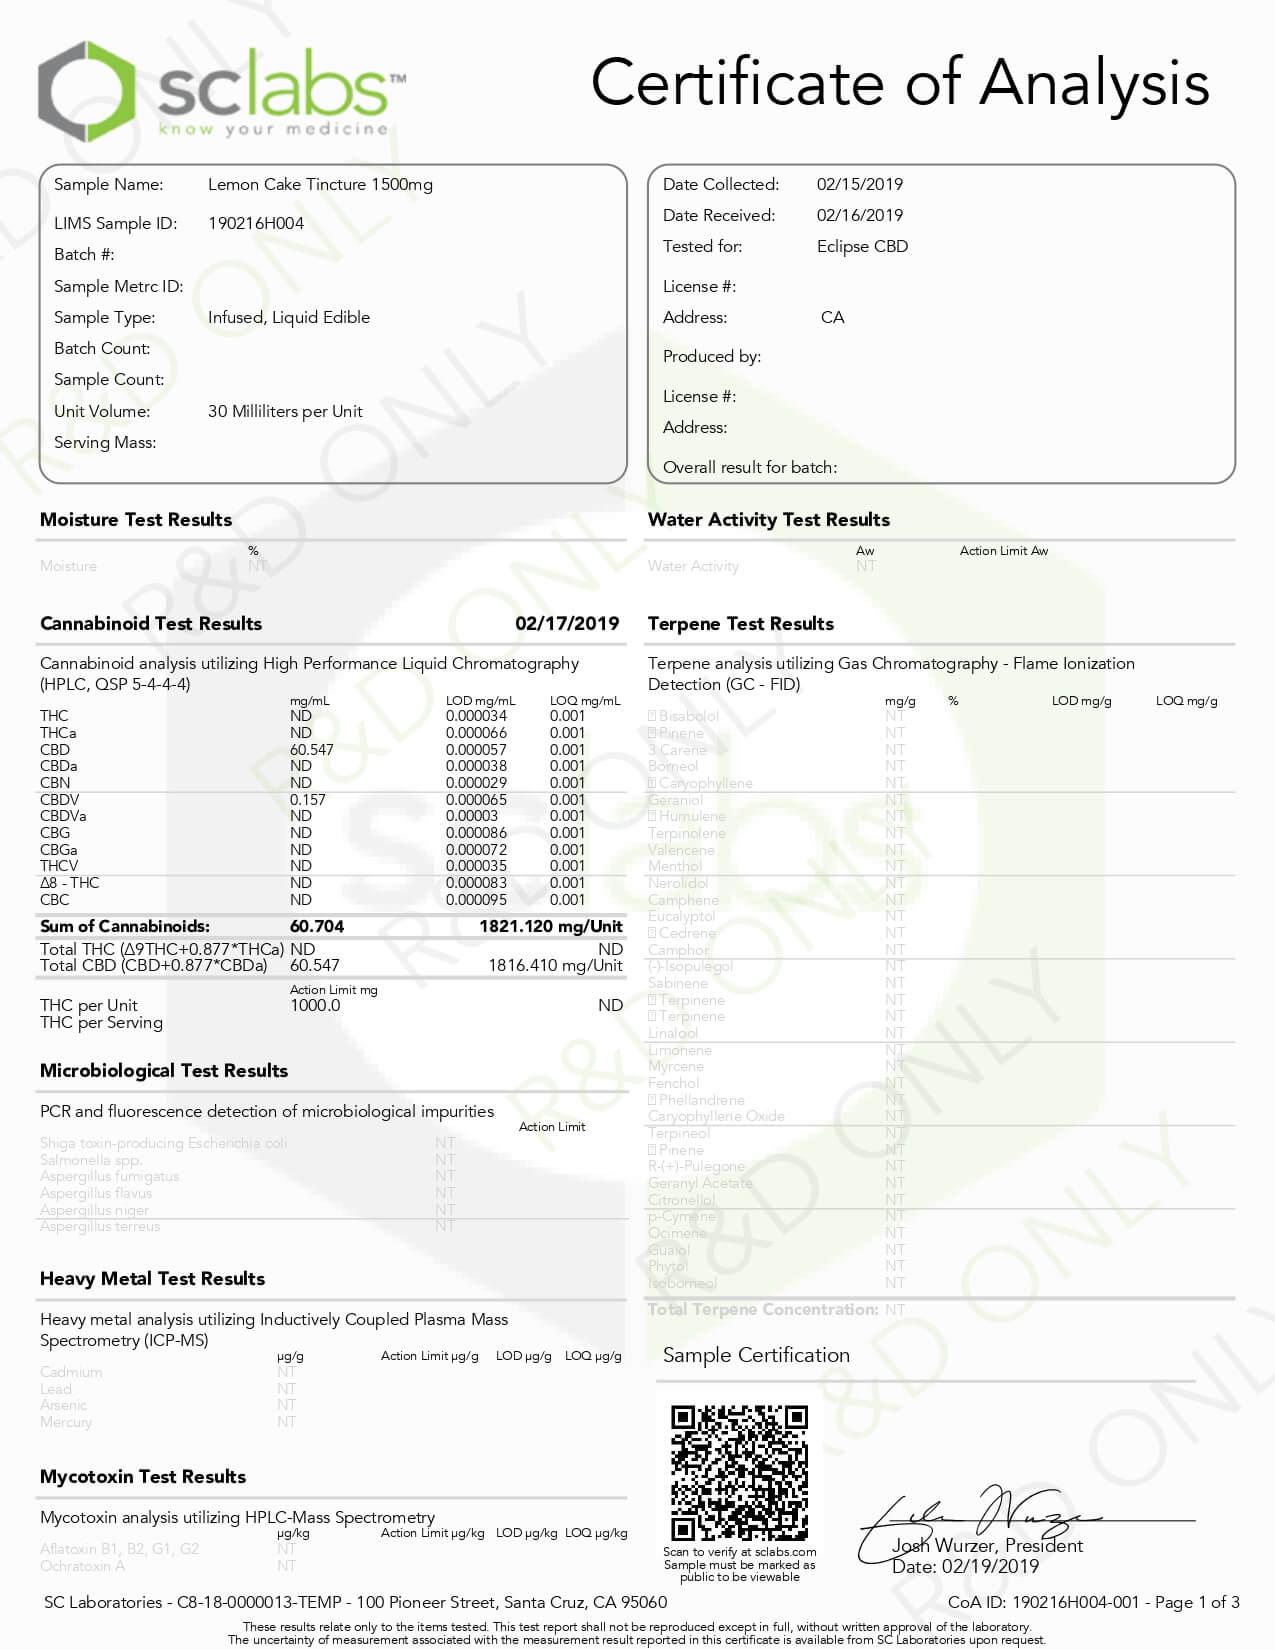 Eclipse CBD MCT Tincture Lemon Cake 1500mg Lab Report